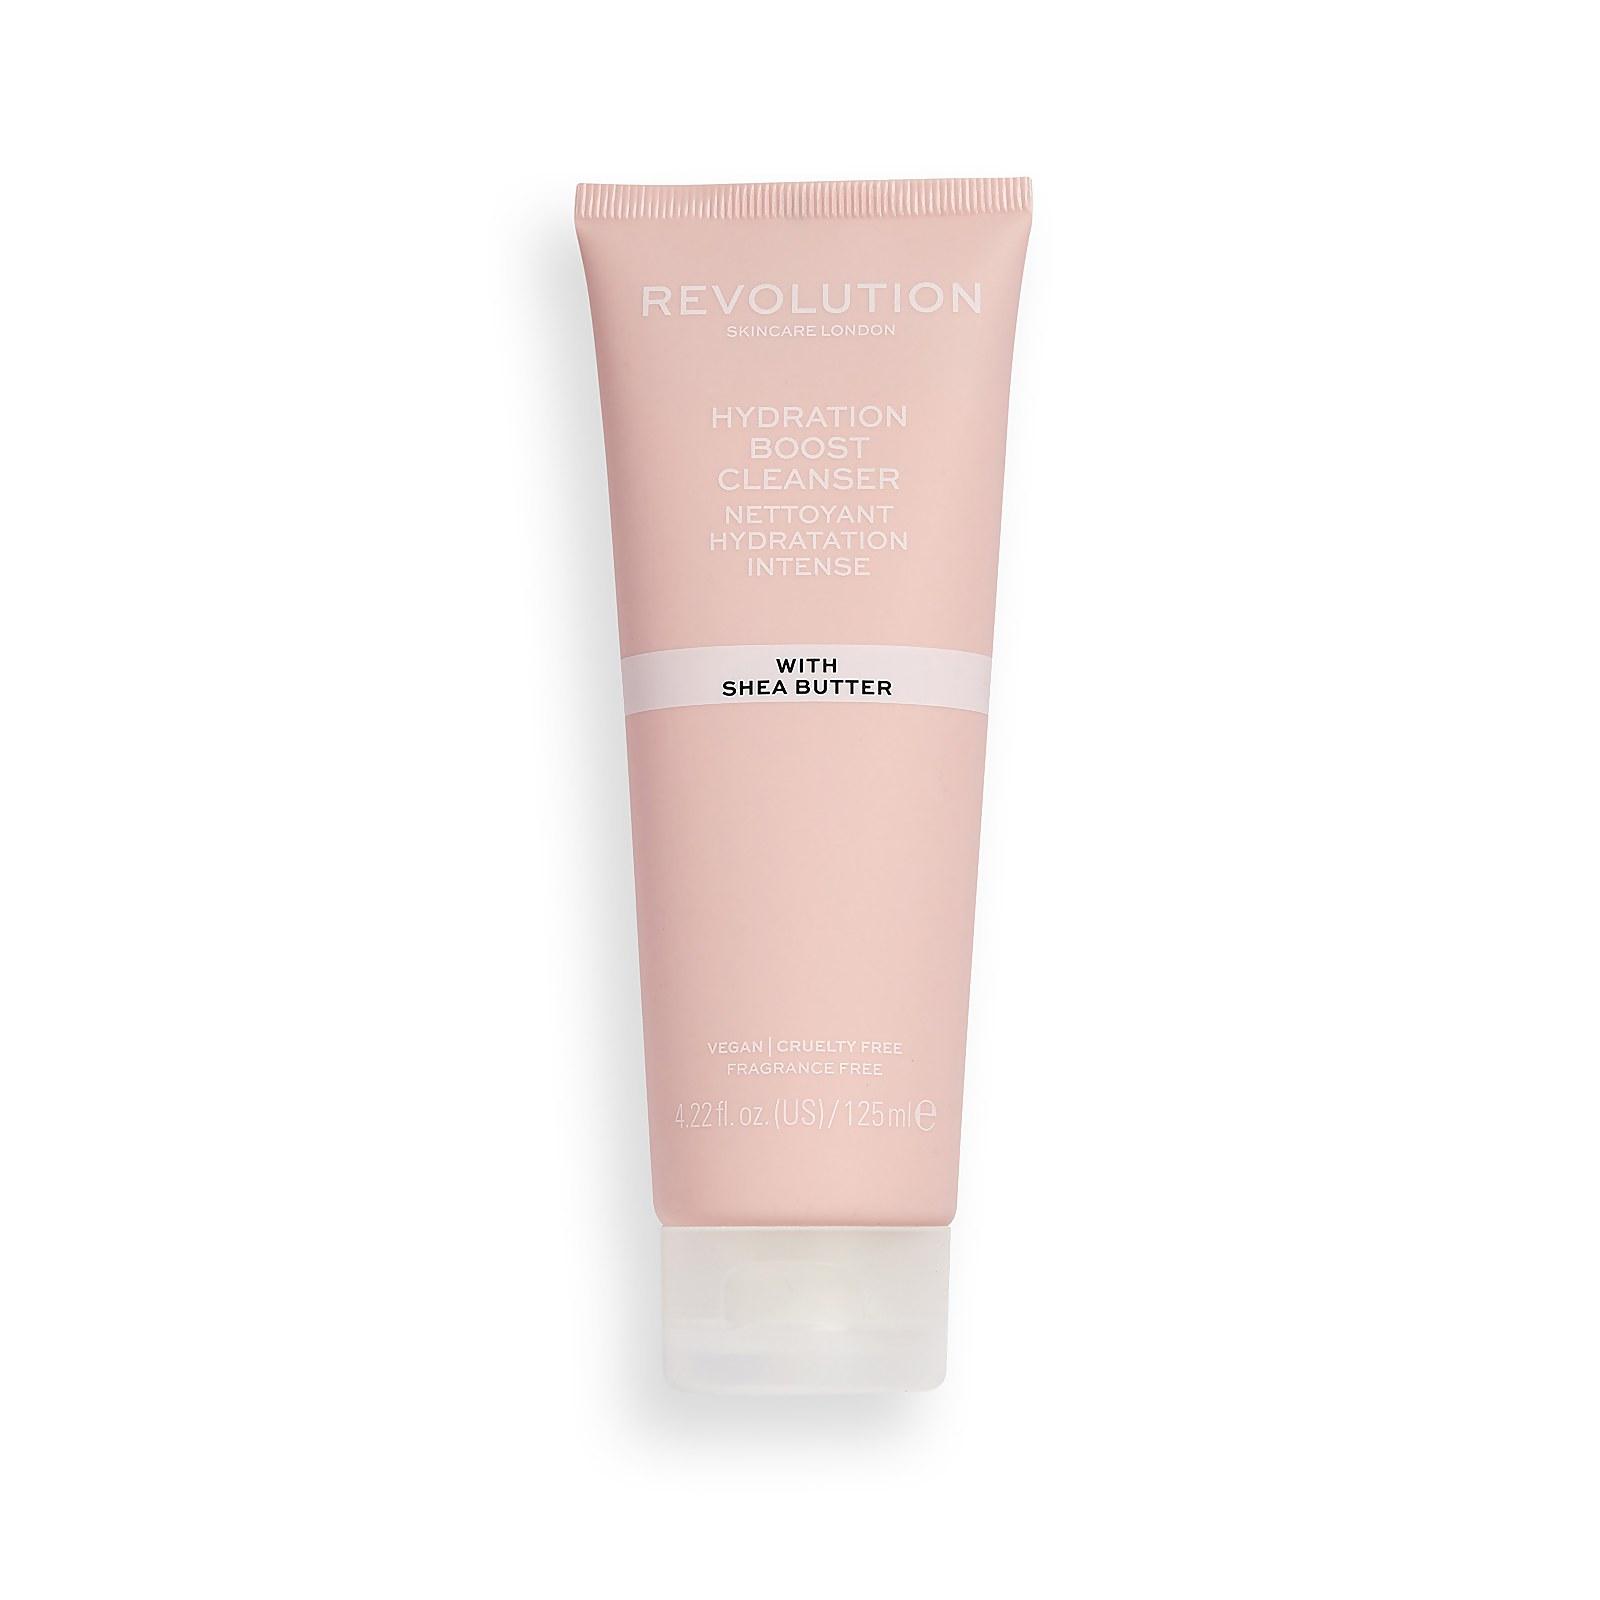 Купить Revolution Skincare Hydration Boost Cleanser 125ml